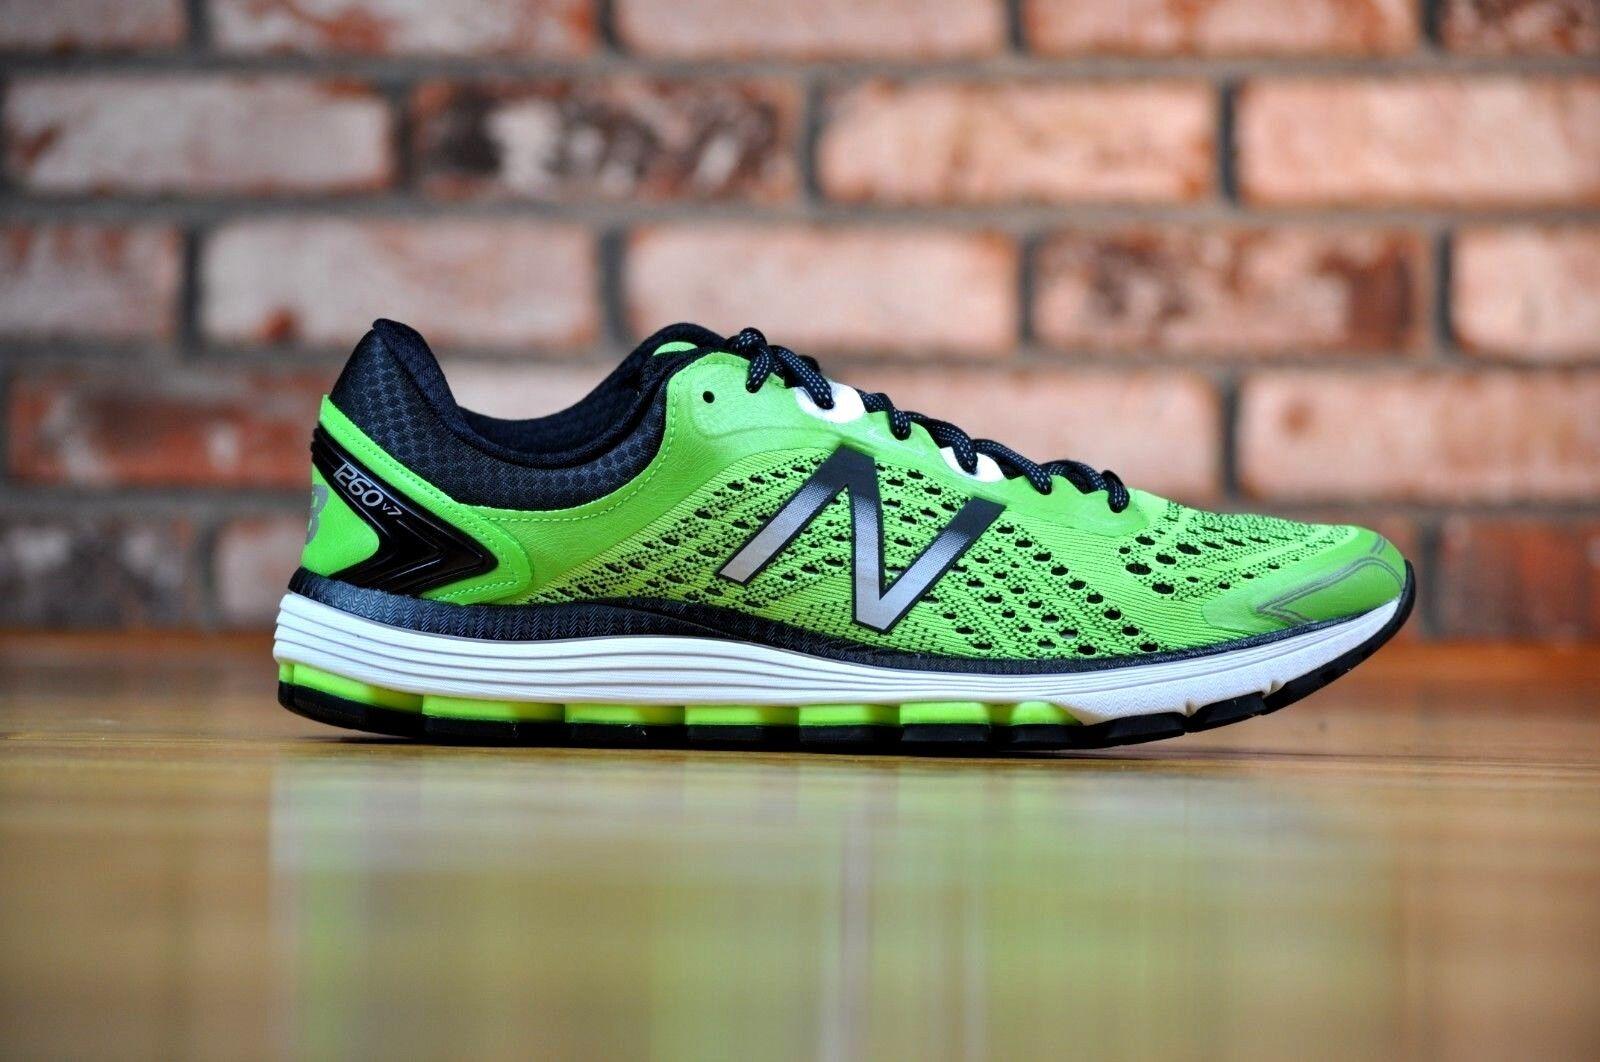 New Balance 1260v7 Energy Lime Black Walking Running shoes M1260GB7 Mens Sz 10 D